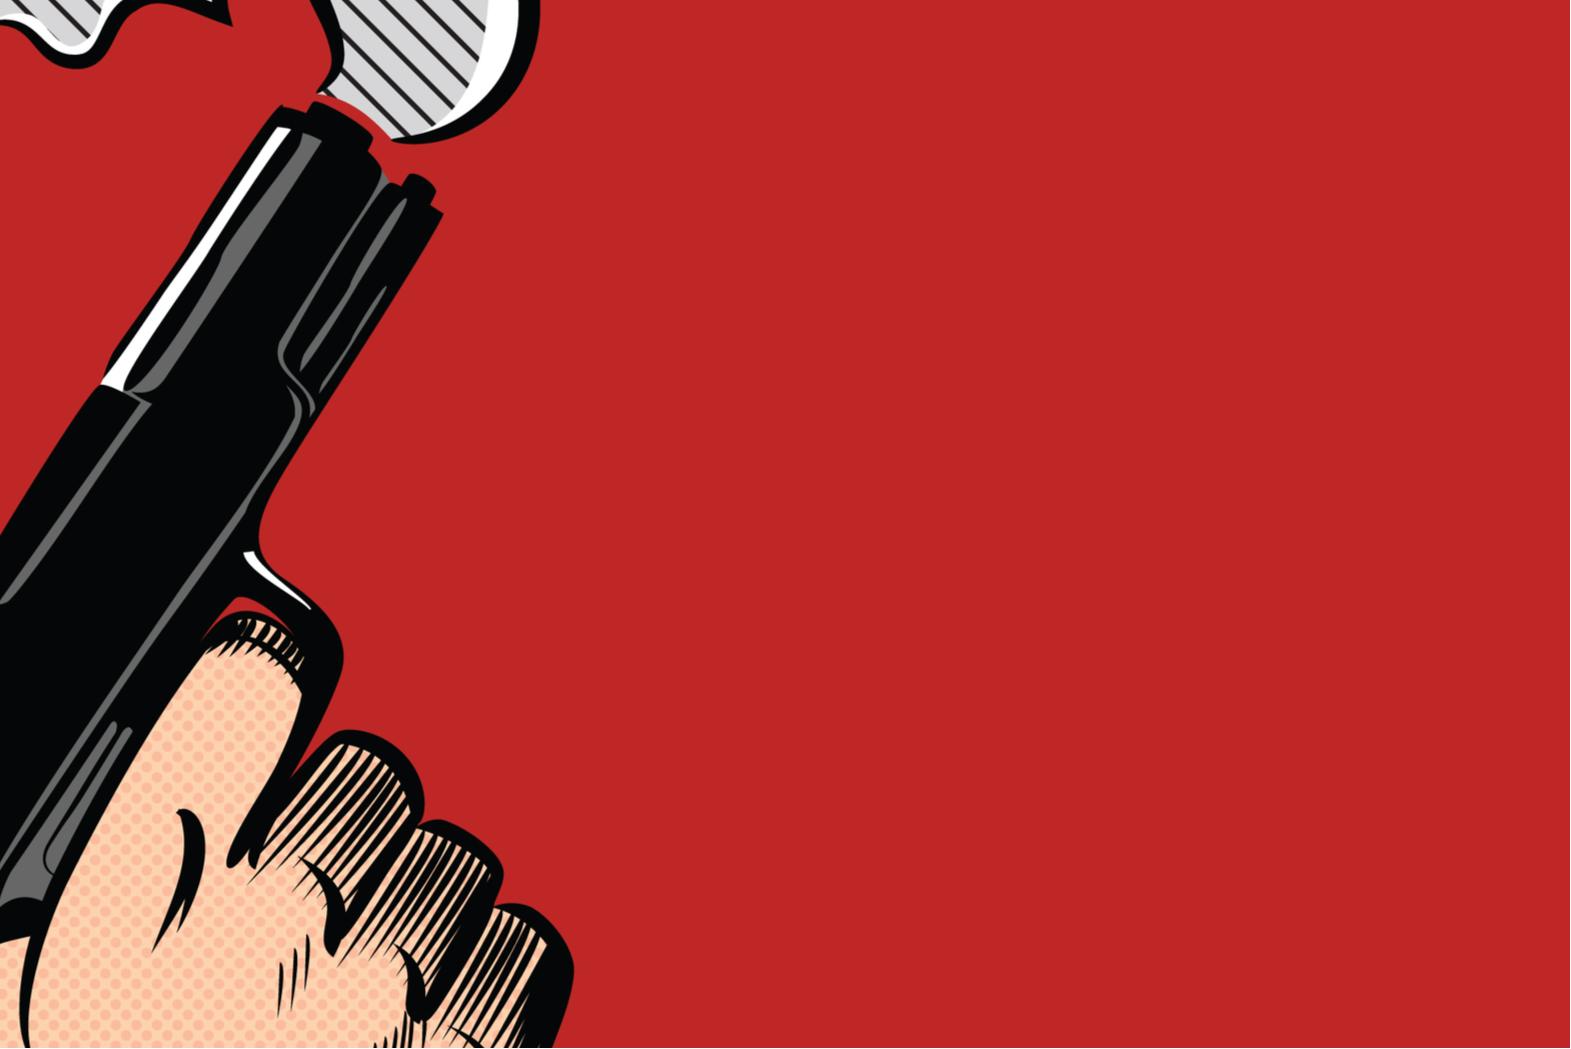 """No smoking gun"" but Huawei security threat too great to ignore, warns report"